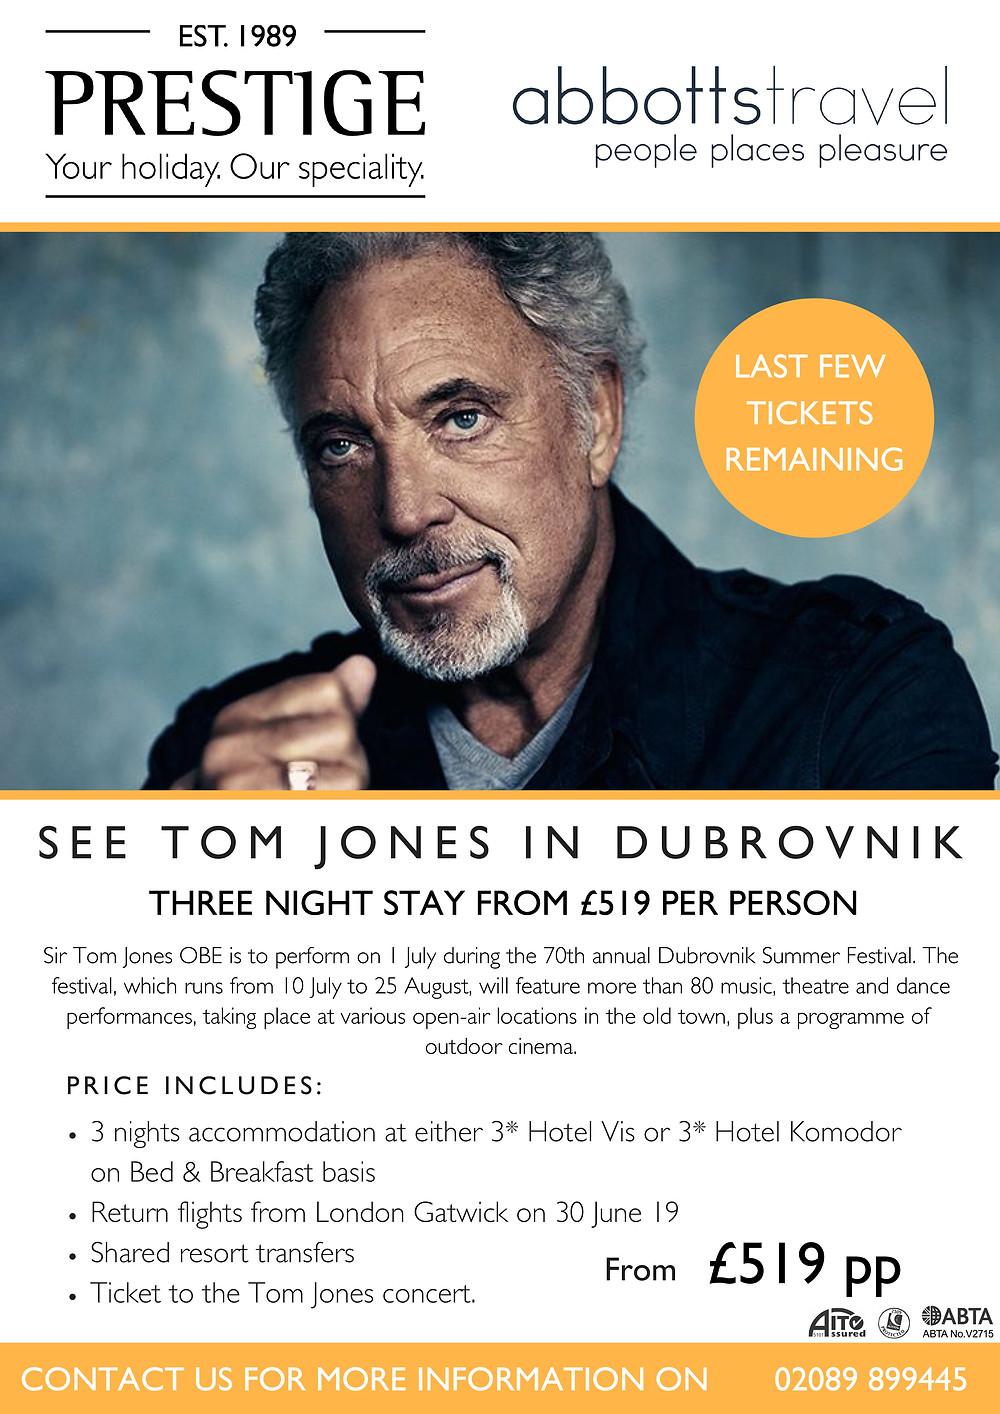 See Tom Jones in Dubrovnik